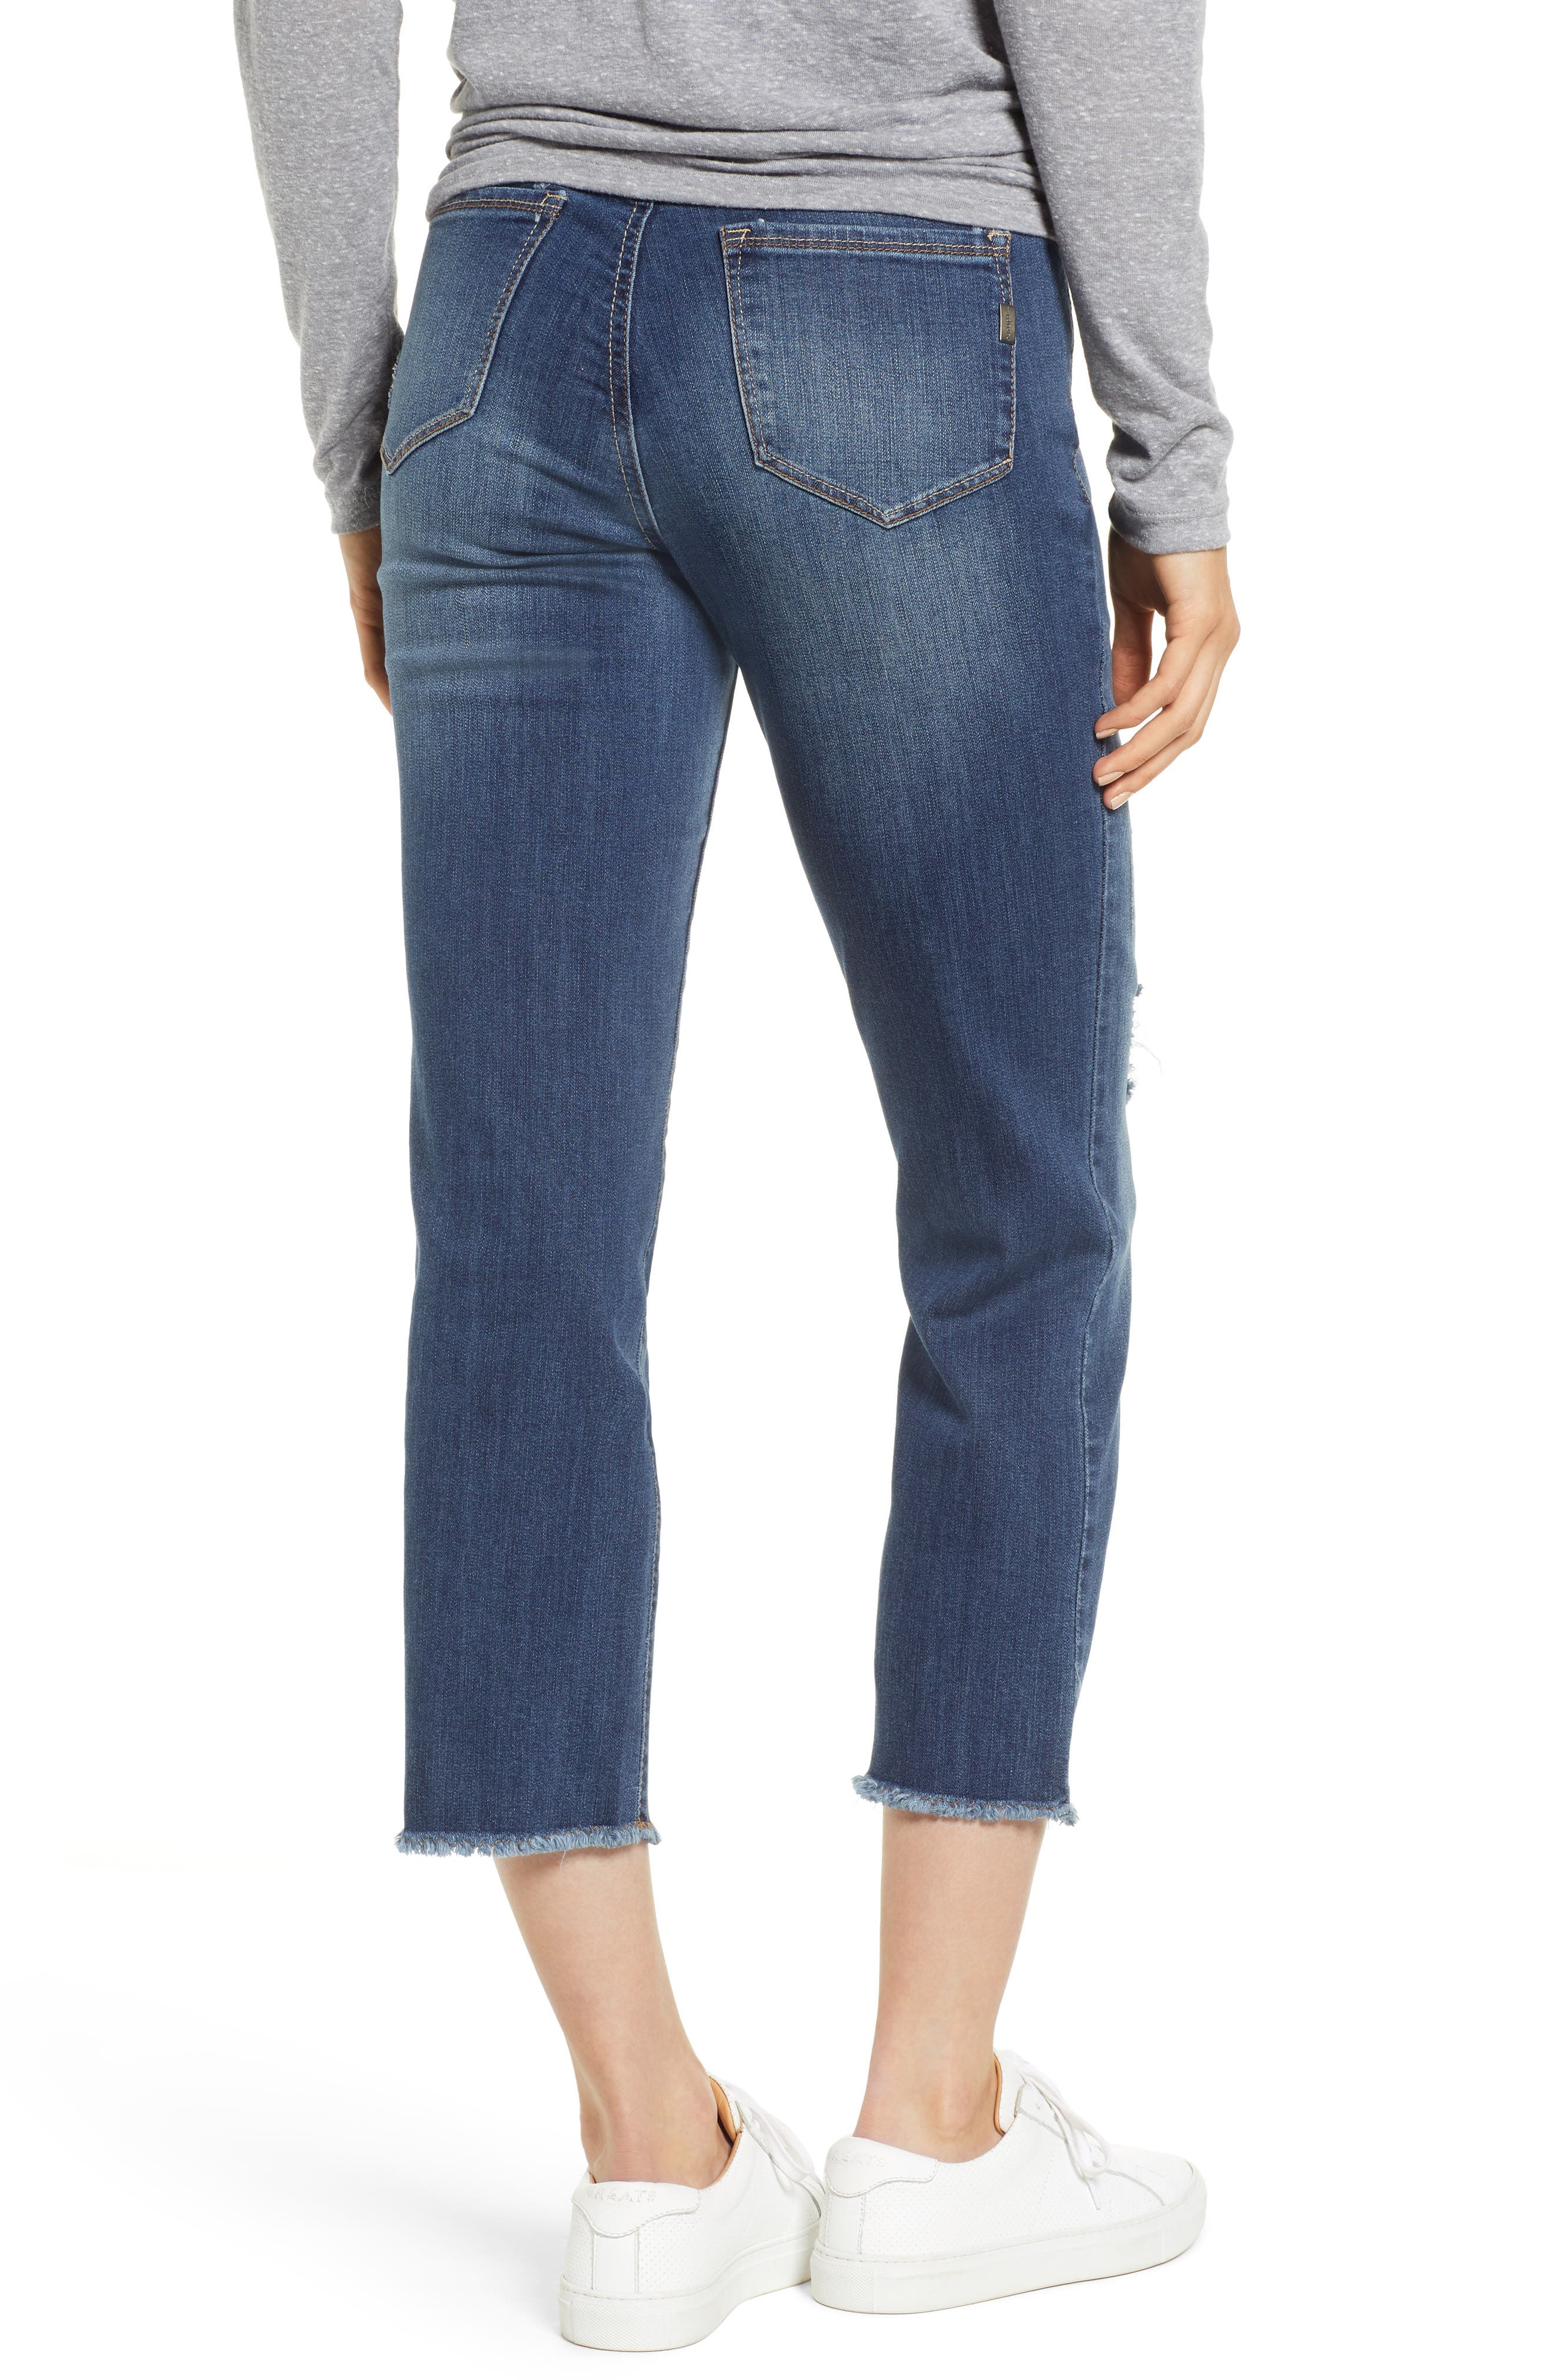 Cassie Crop Straight Leg Maternity Jeans,                             Alternate thumbnail 2, color,                             CASSIE